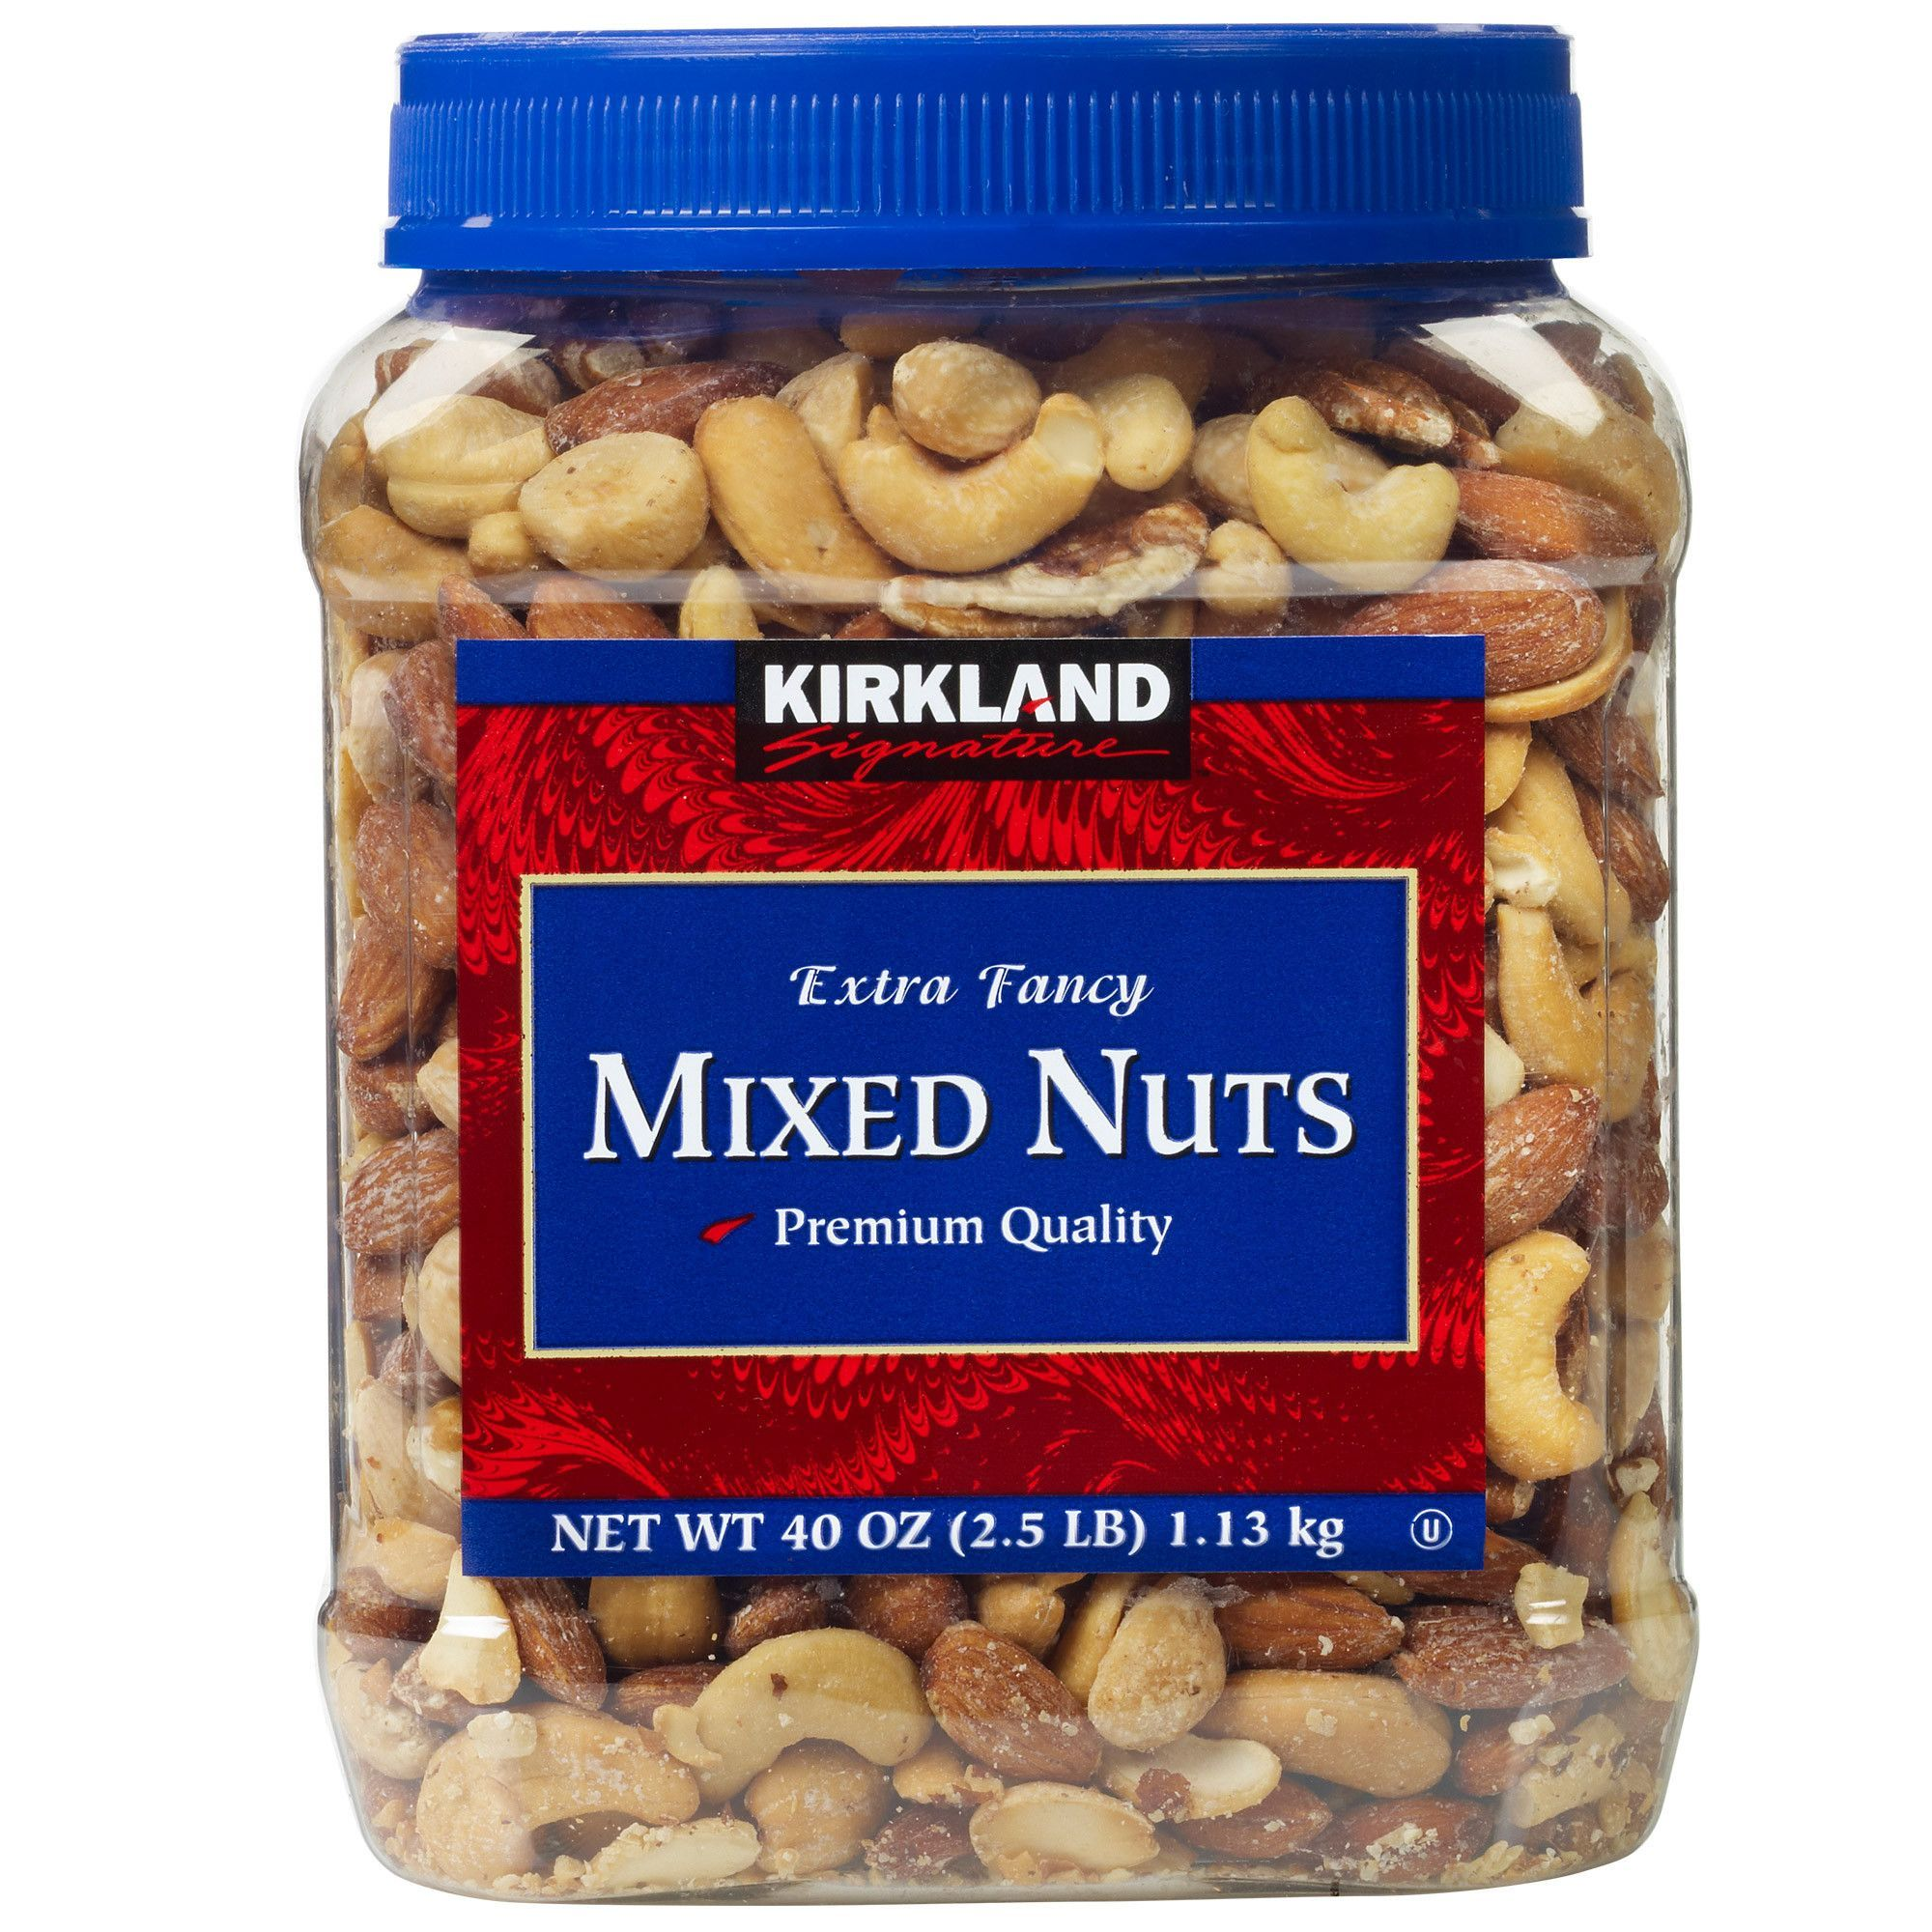 Kirkland signature mixed nuts 25 lbs 2count mixed nuts